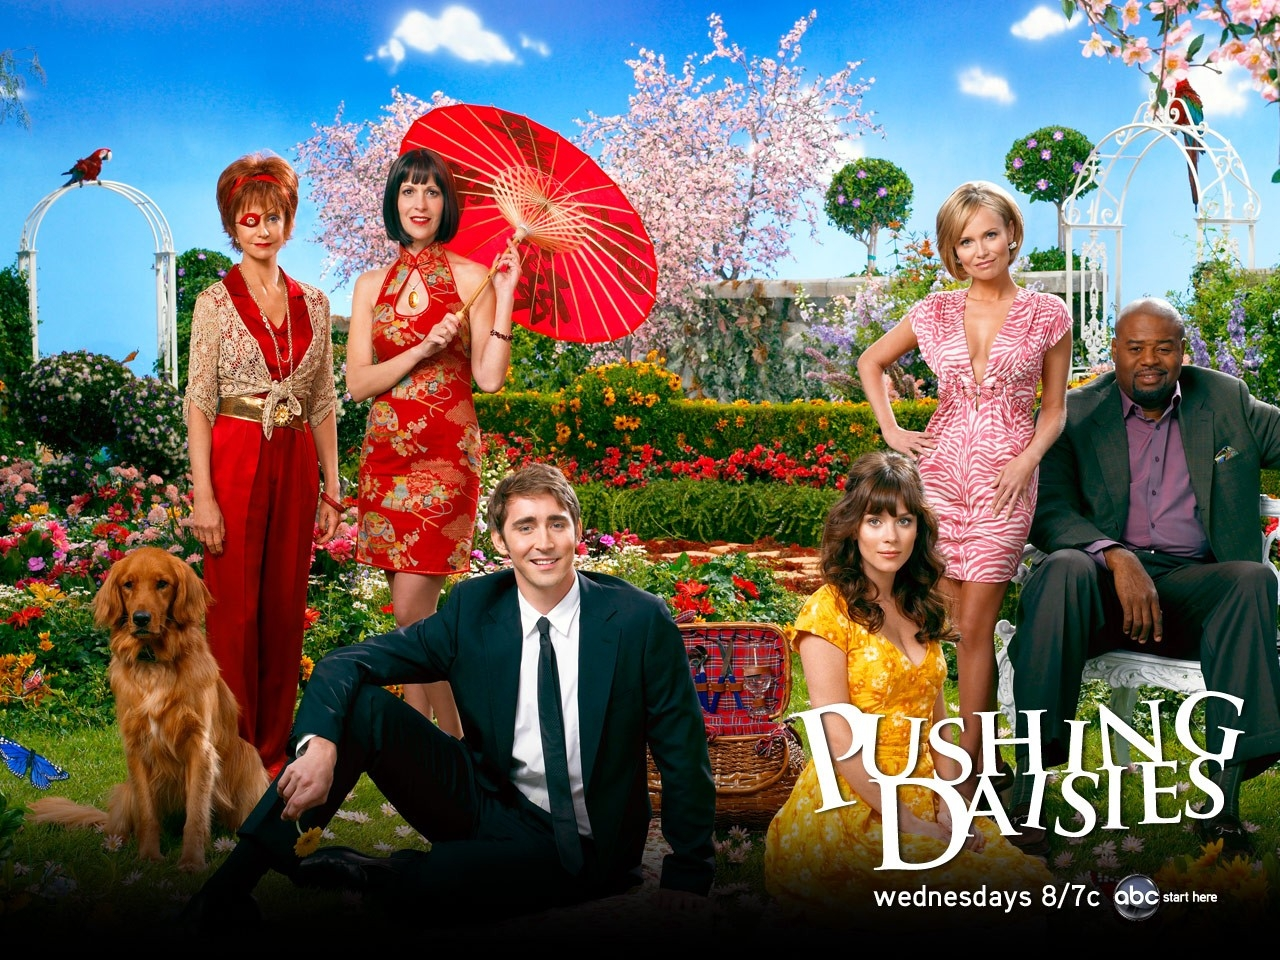 Wallpaper della serie tv Pushing Daisies